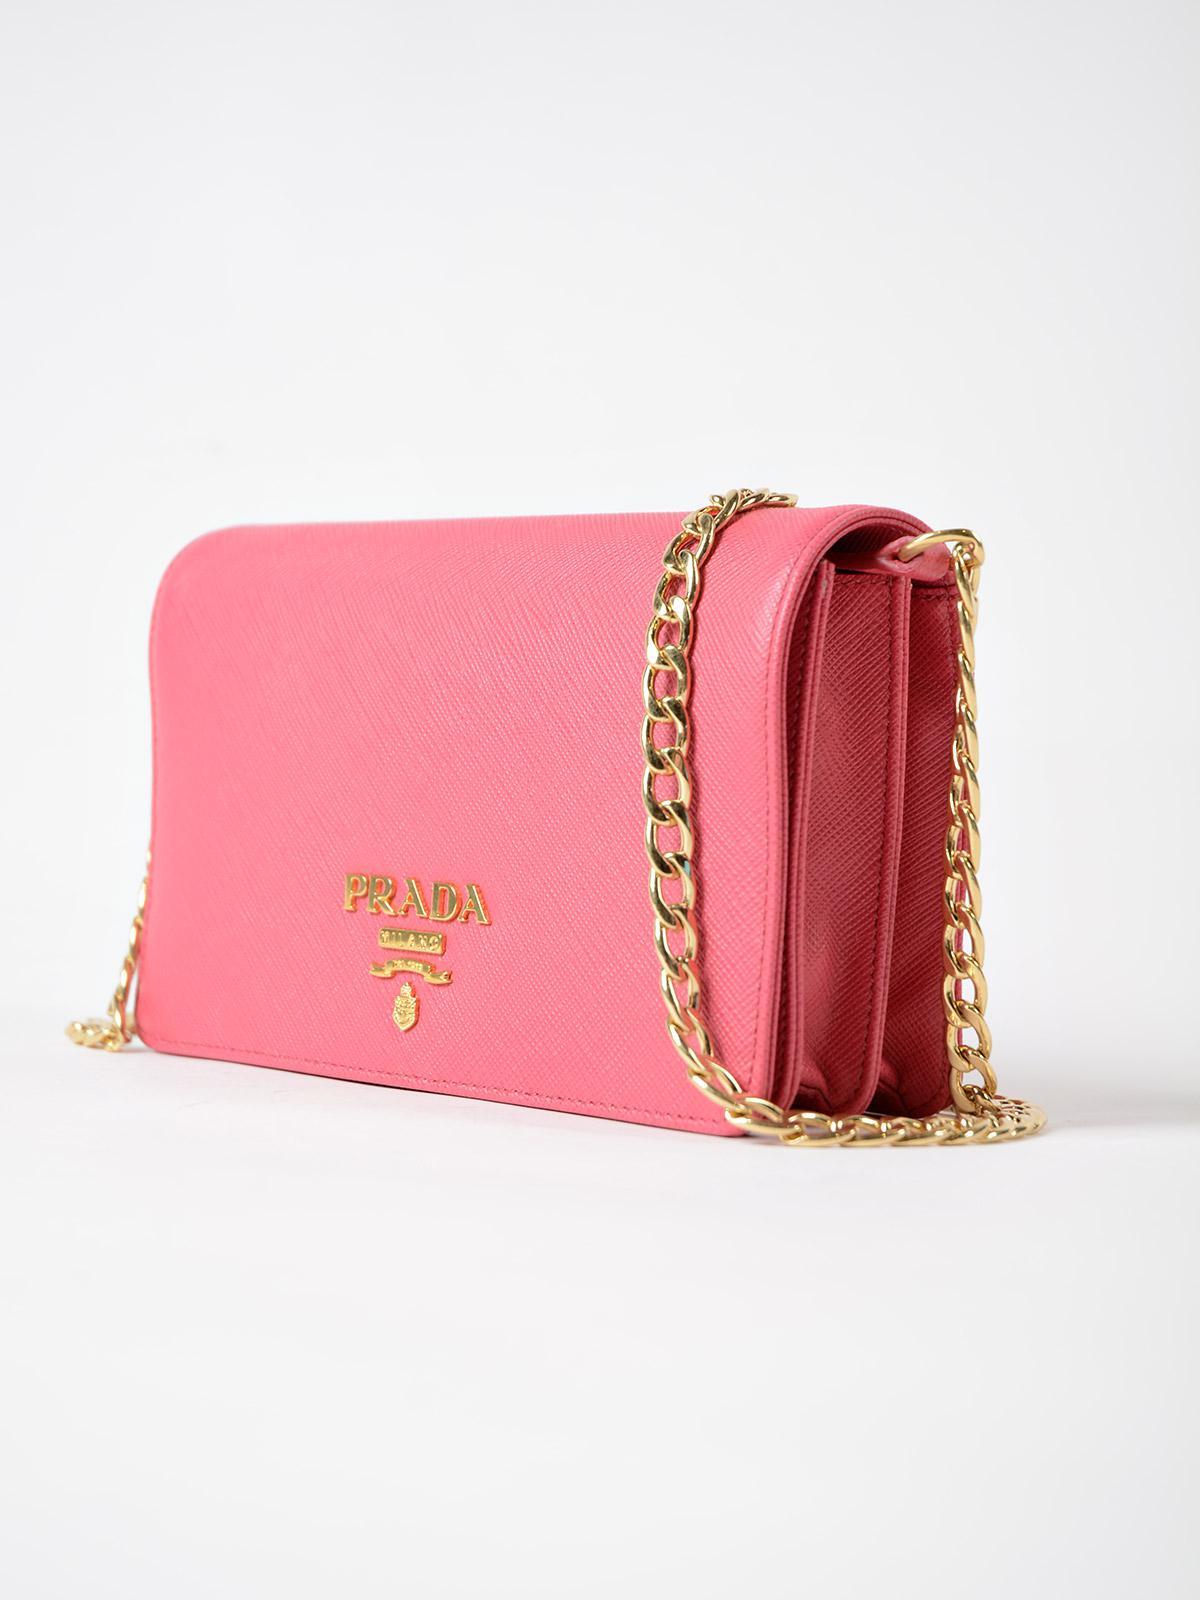 Prada Leather Saffiano Lux Crossbody in Pink